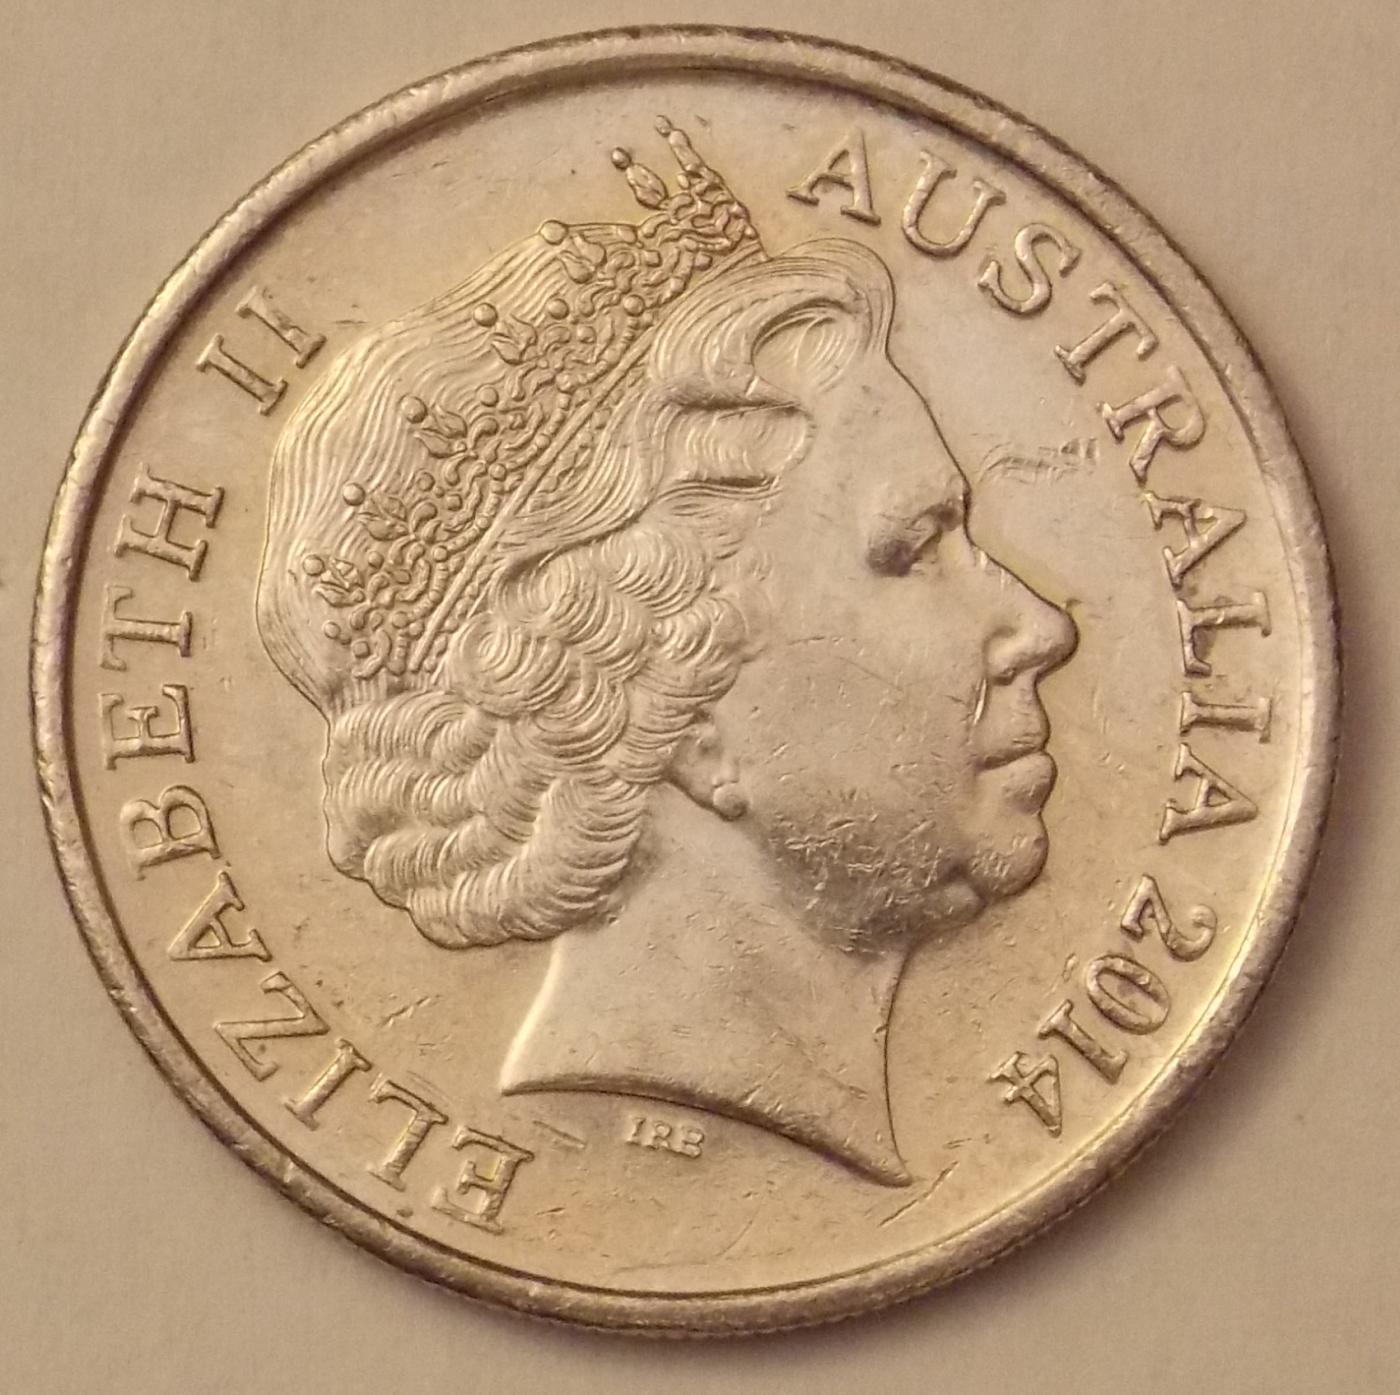 10 Cents 2014 Elizabeth Ii 1952 Present Australia